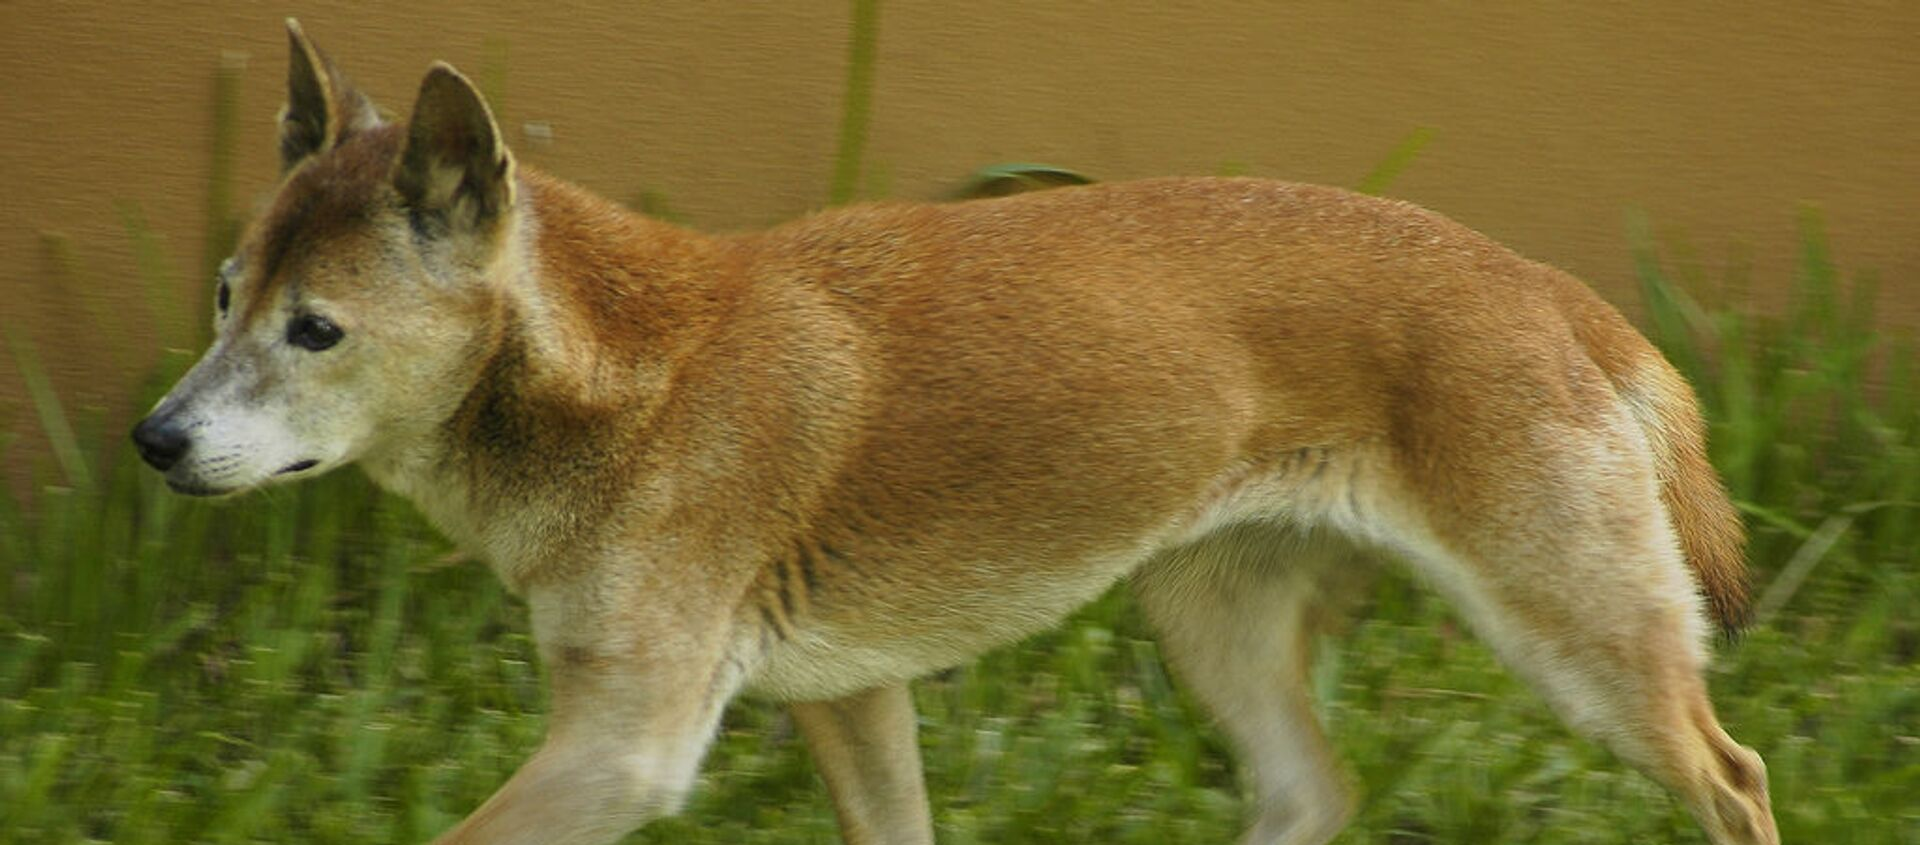 El perro cantor de Nueva Guinea - Sputnik Mundo, 1920, 01.09.2020